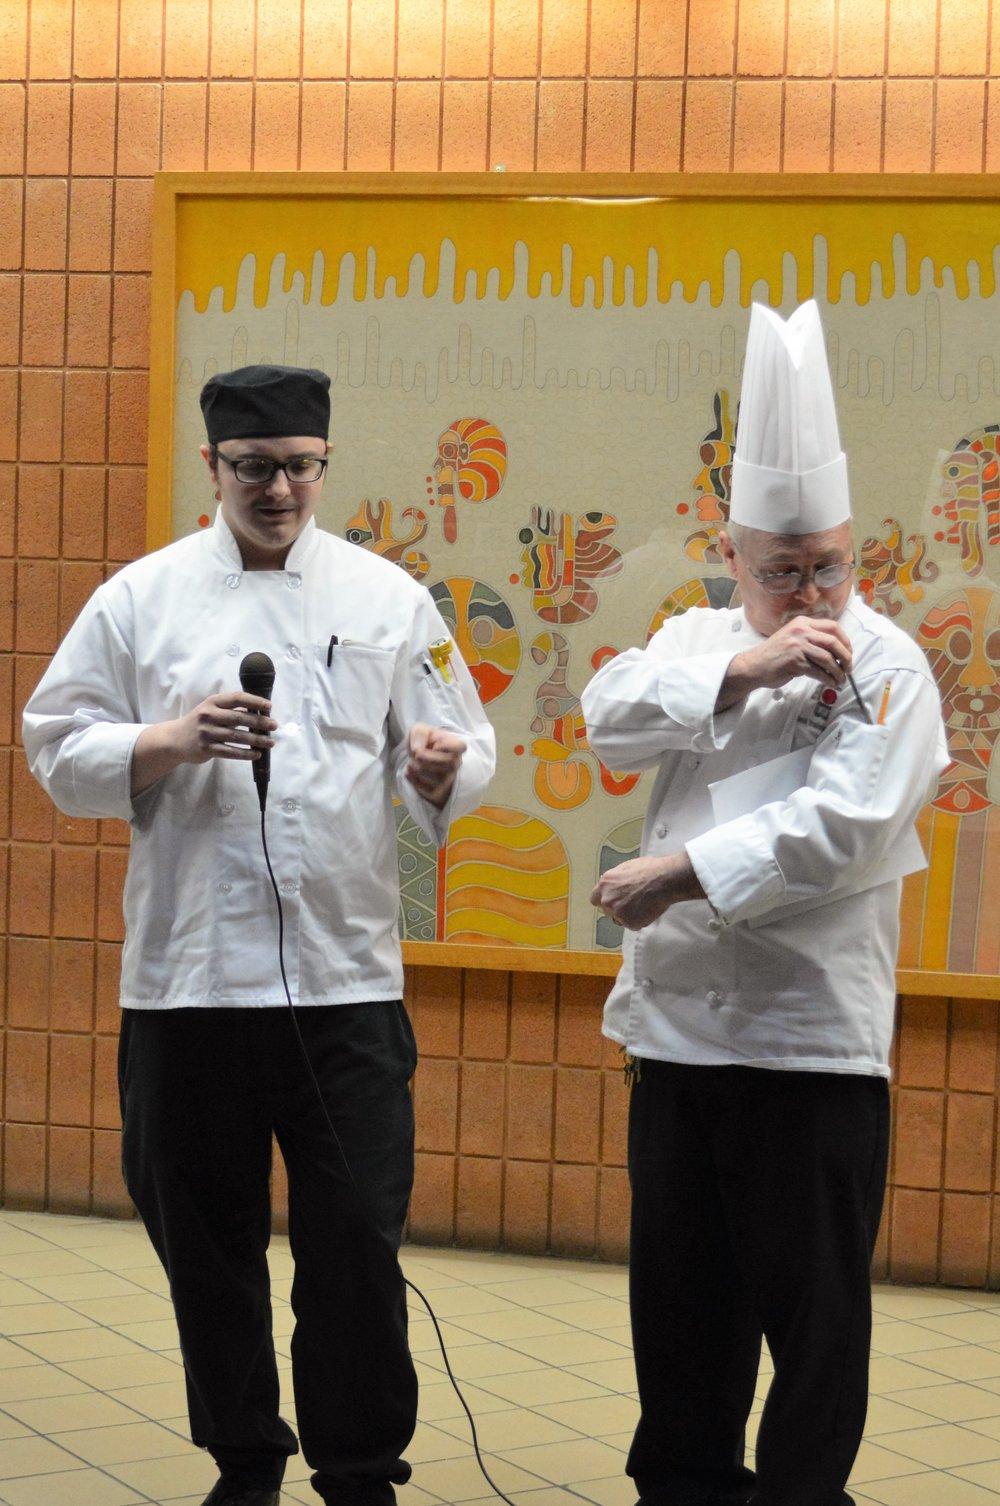 Third place winner Austin Dorn with Chef Chuck Baux.